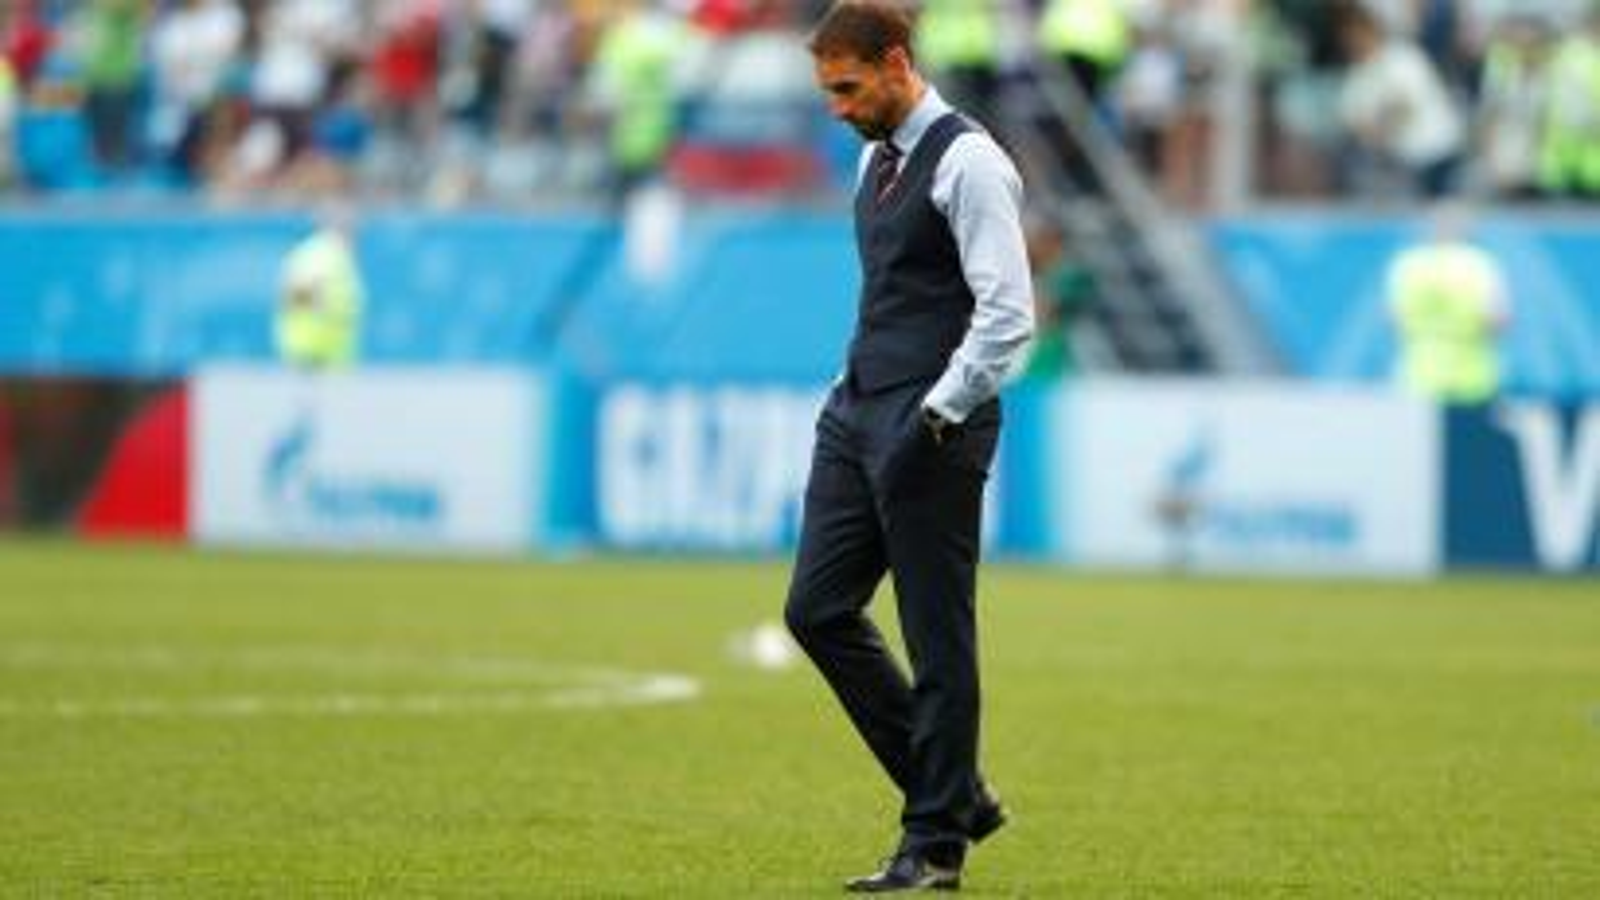 England football coach Gareth Southgate